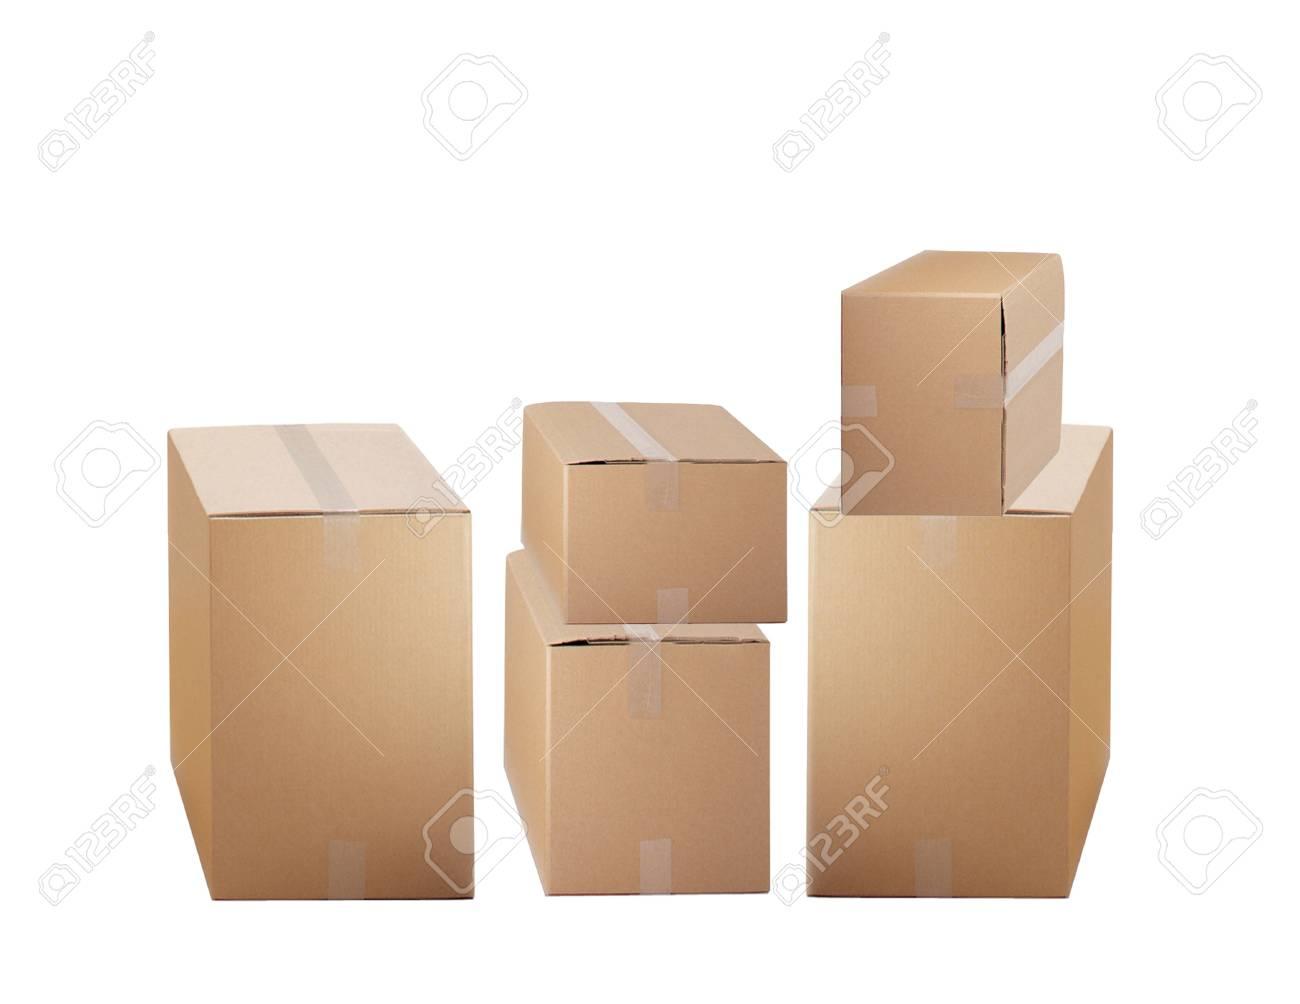 cardboard boxes isolated on white background Stock Photo - 13173622